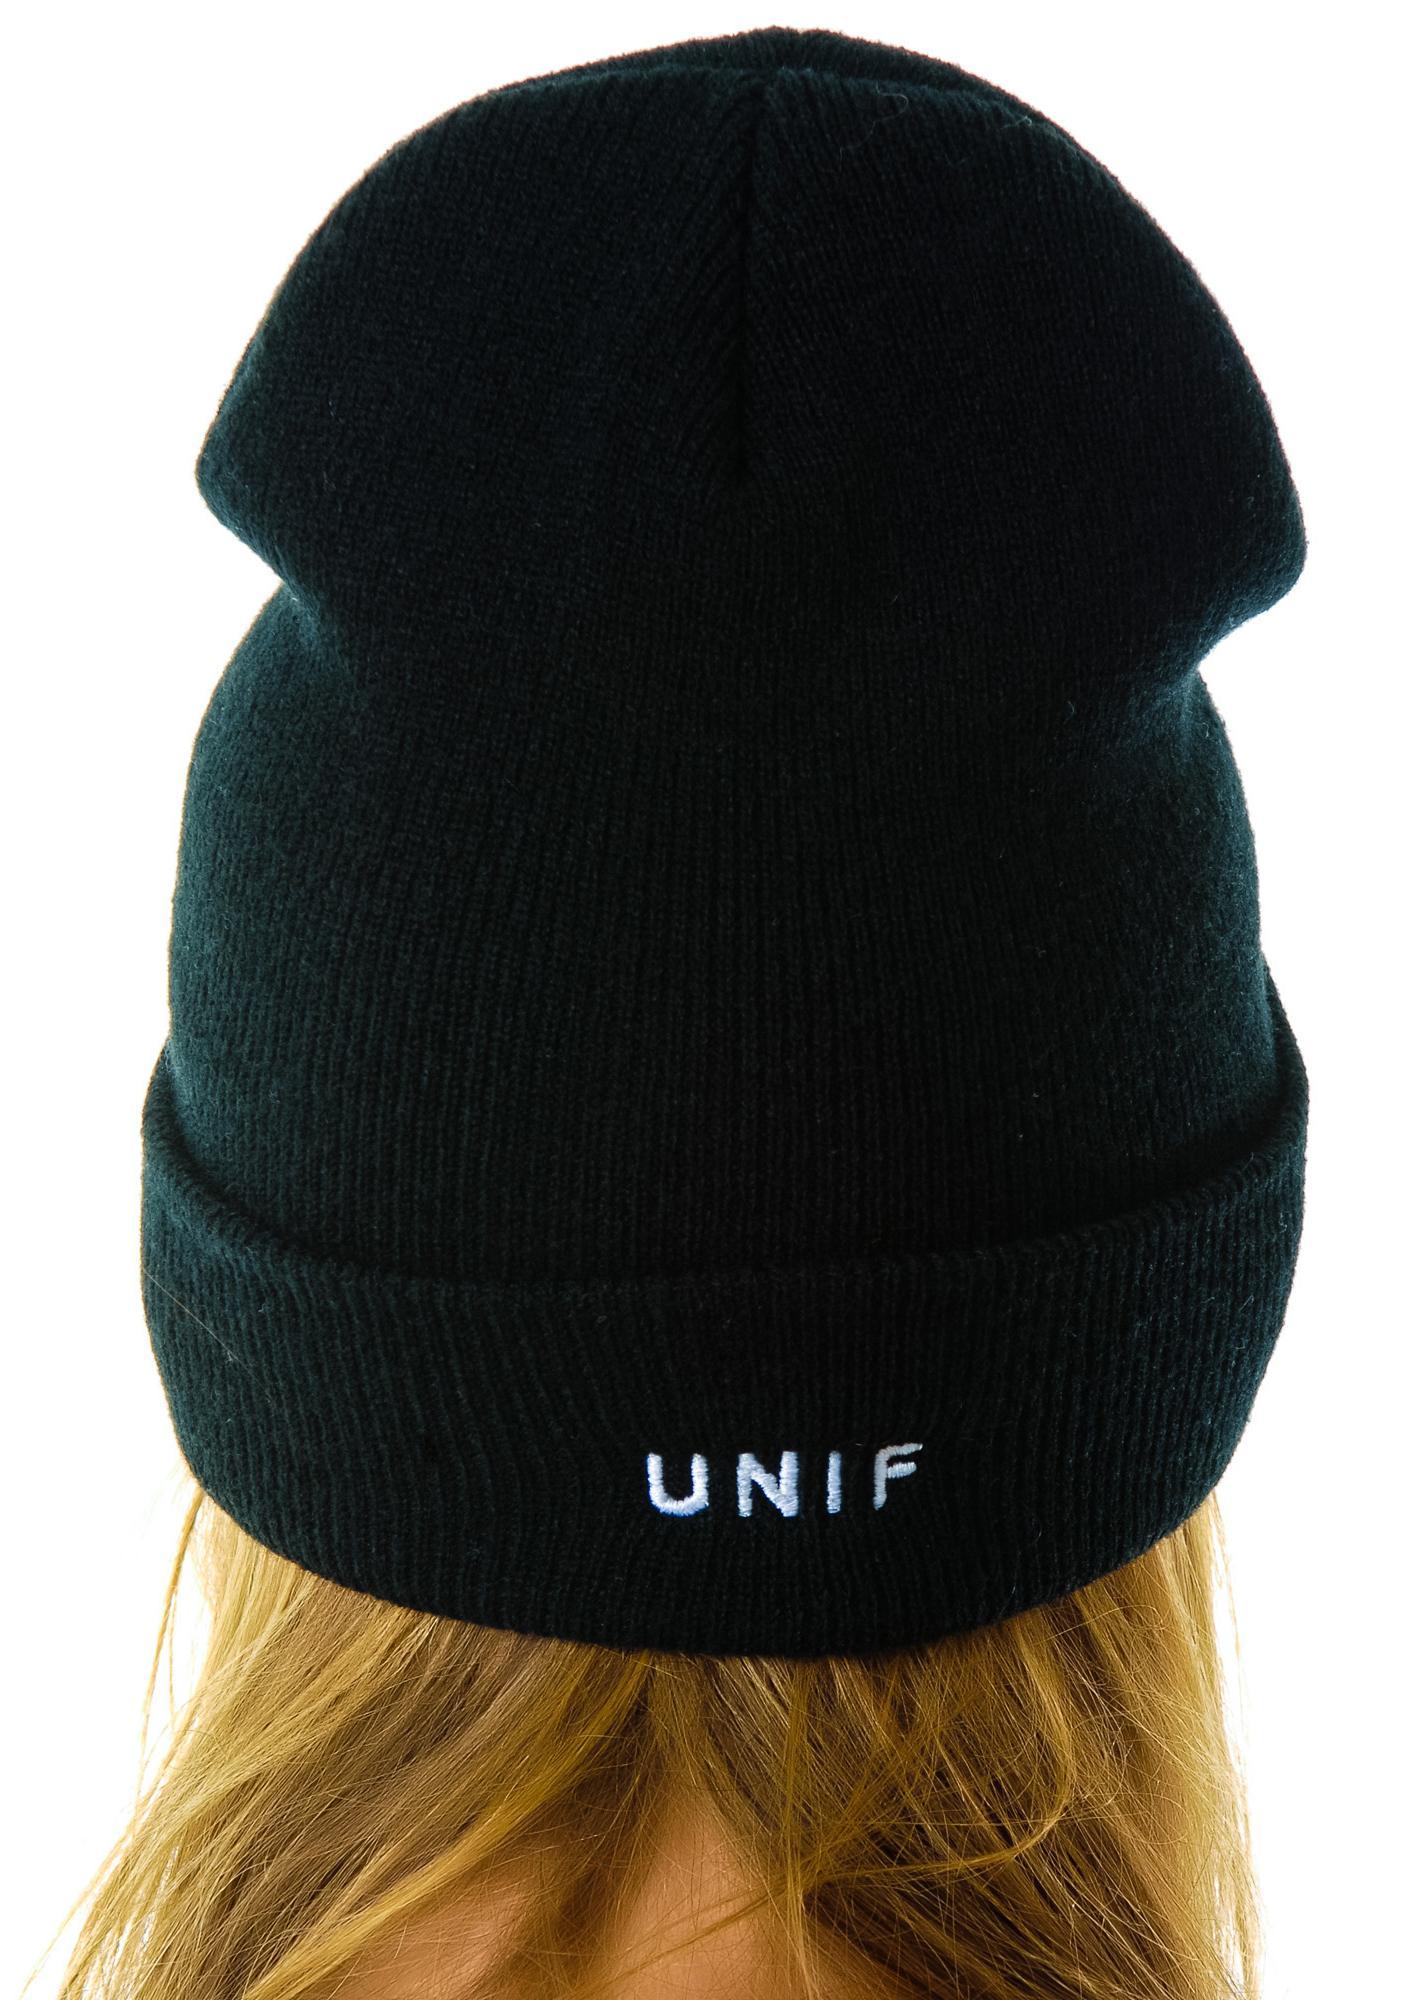 UNIF Eye Don't Care Beanie